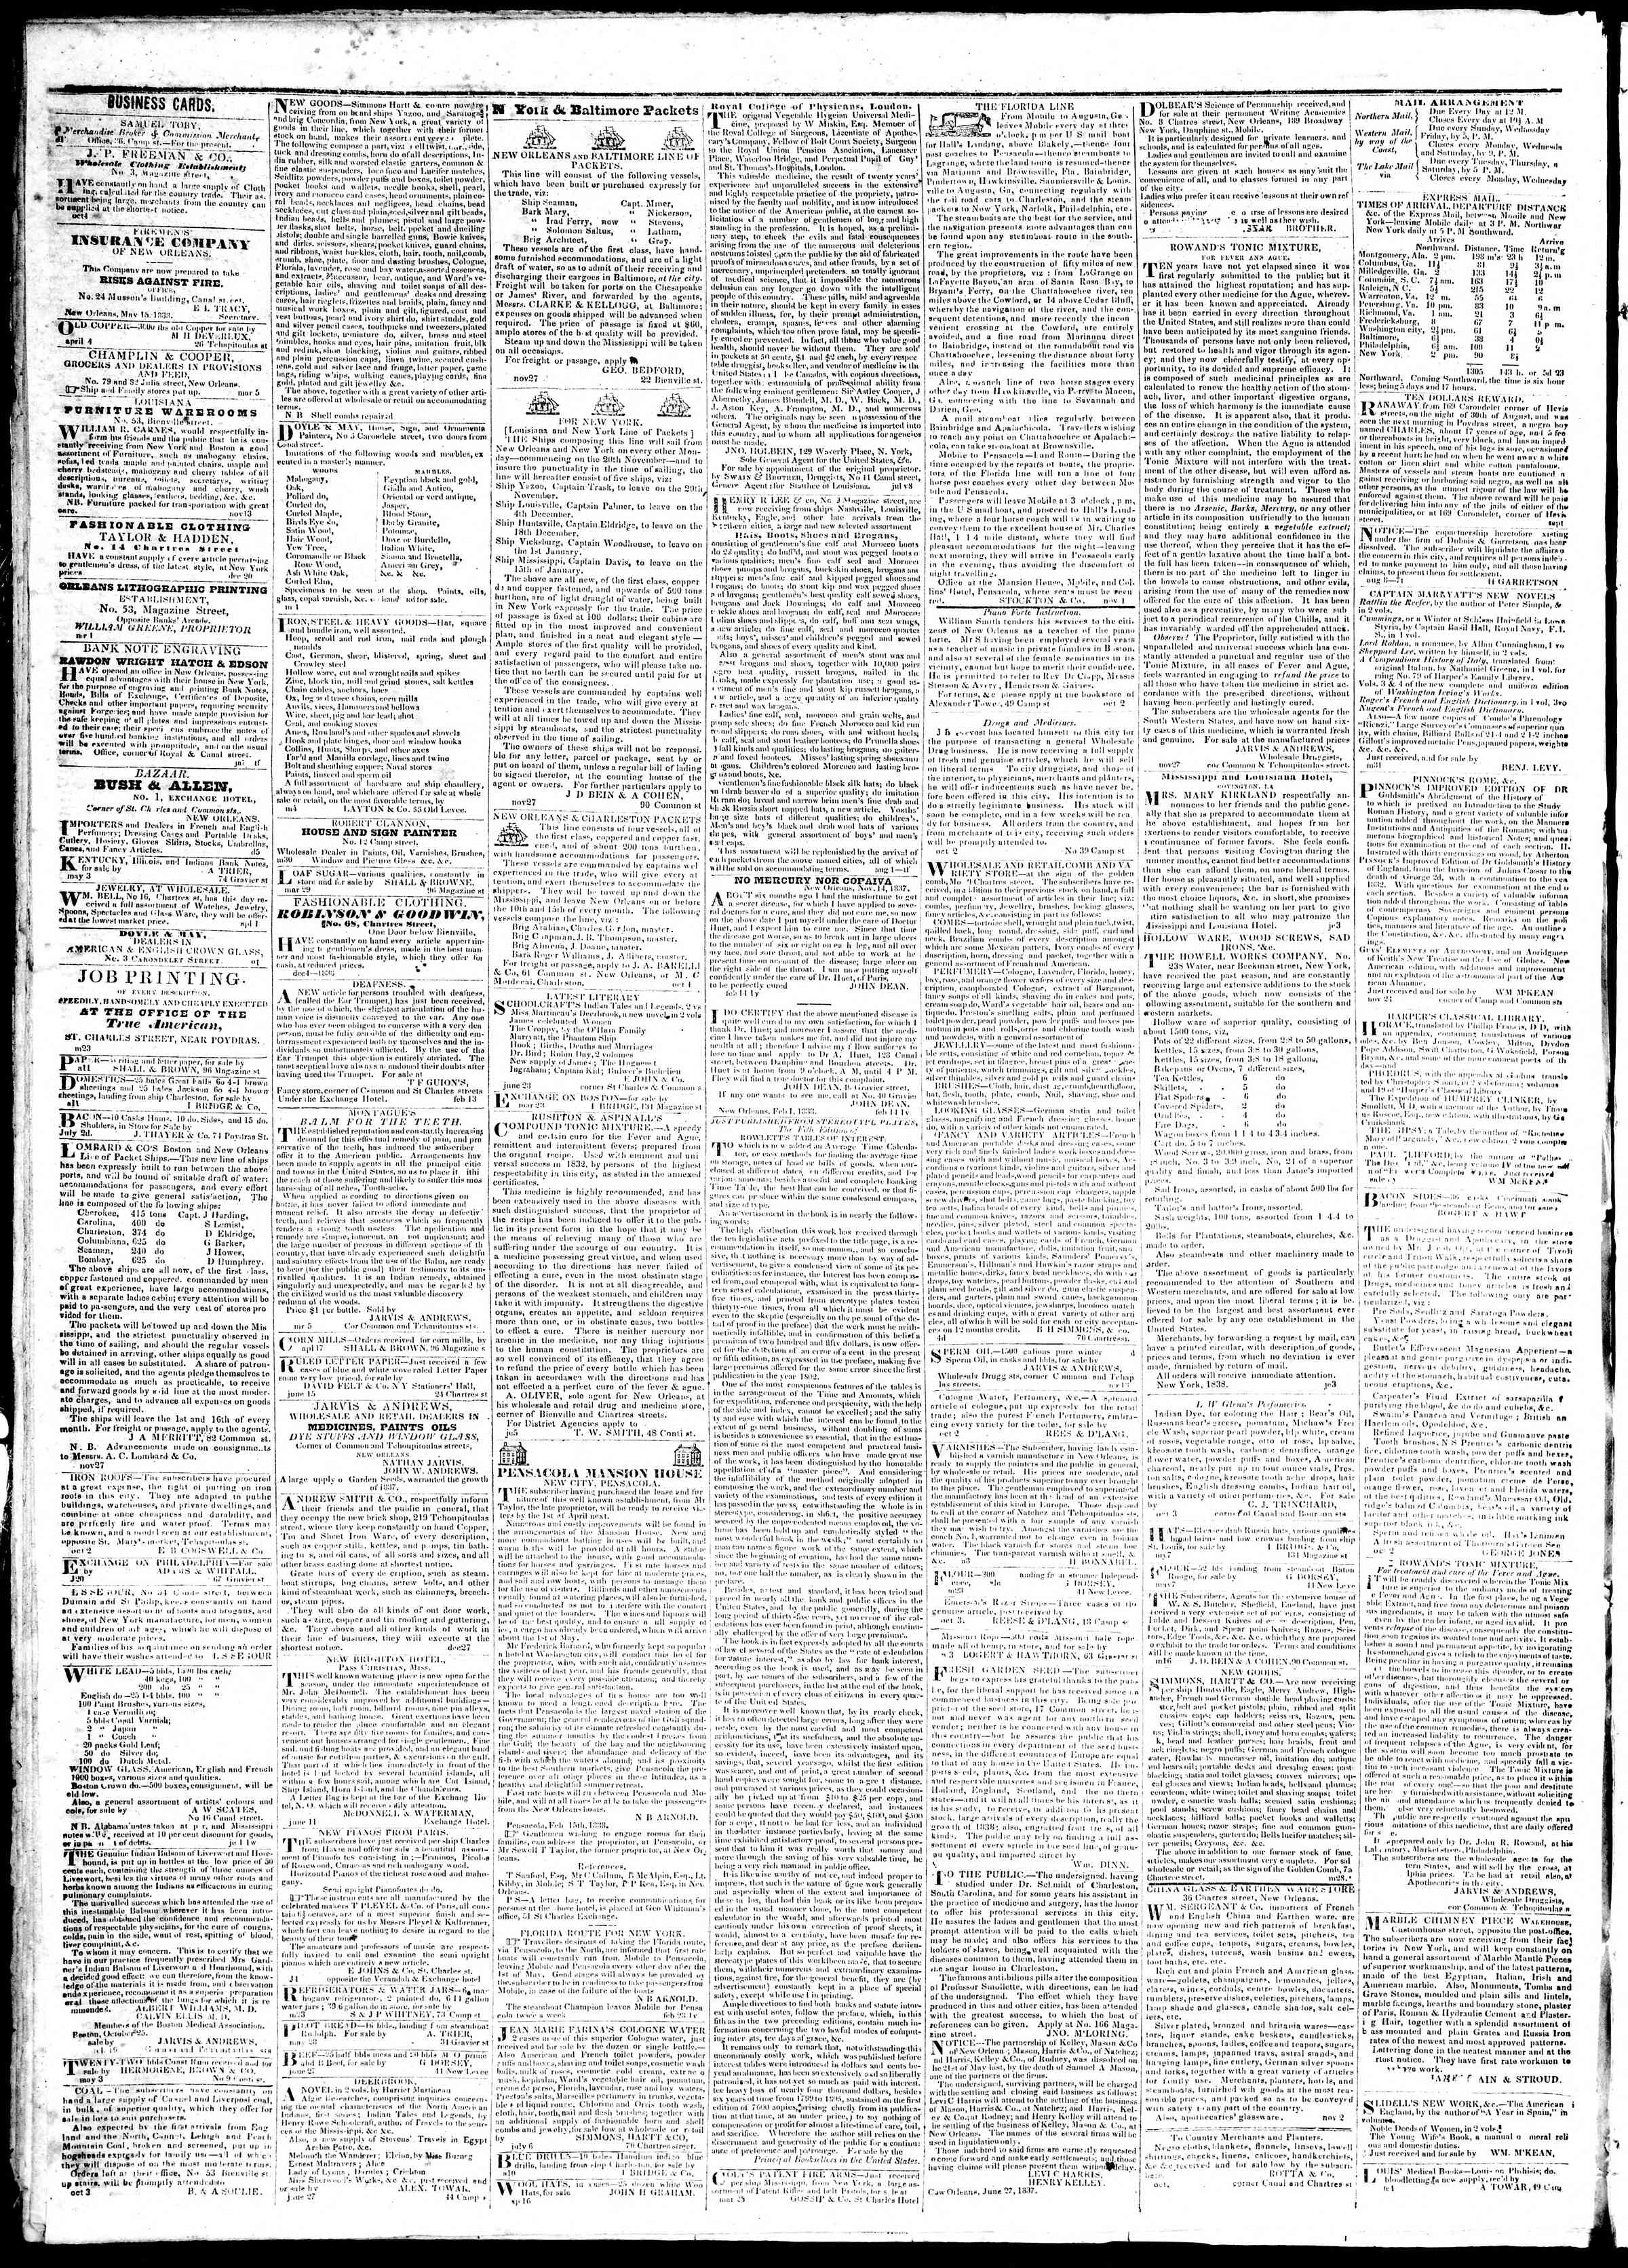 July 13, 1839 Tarihli True American Gazetesi Sayfa 4